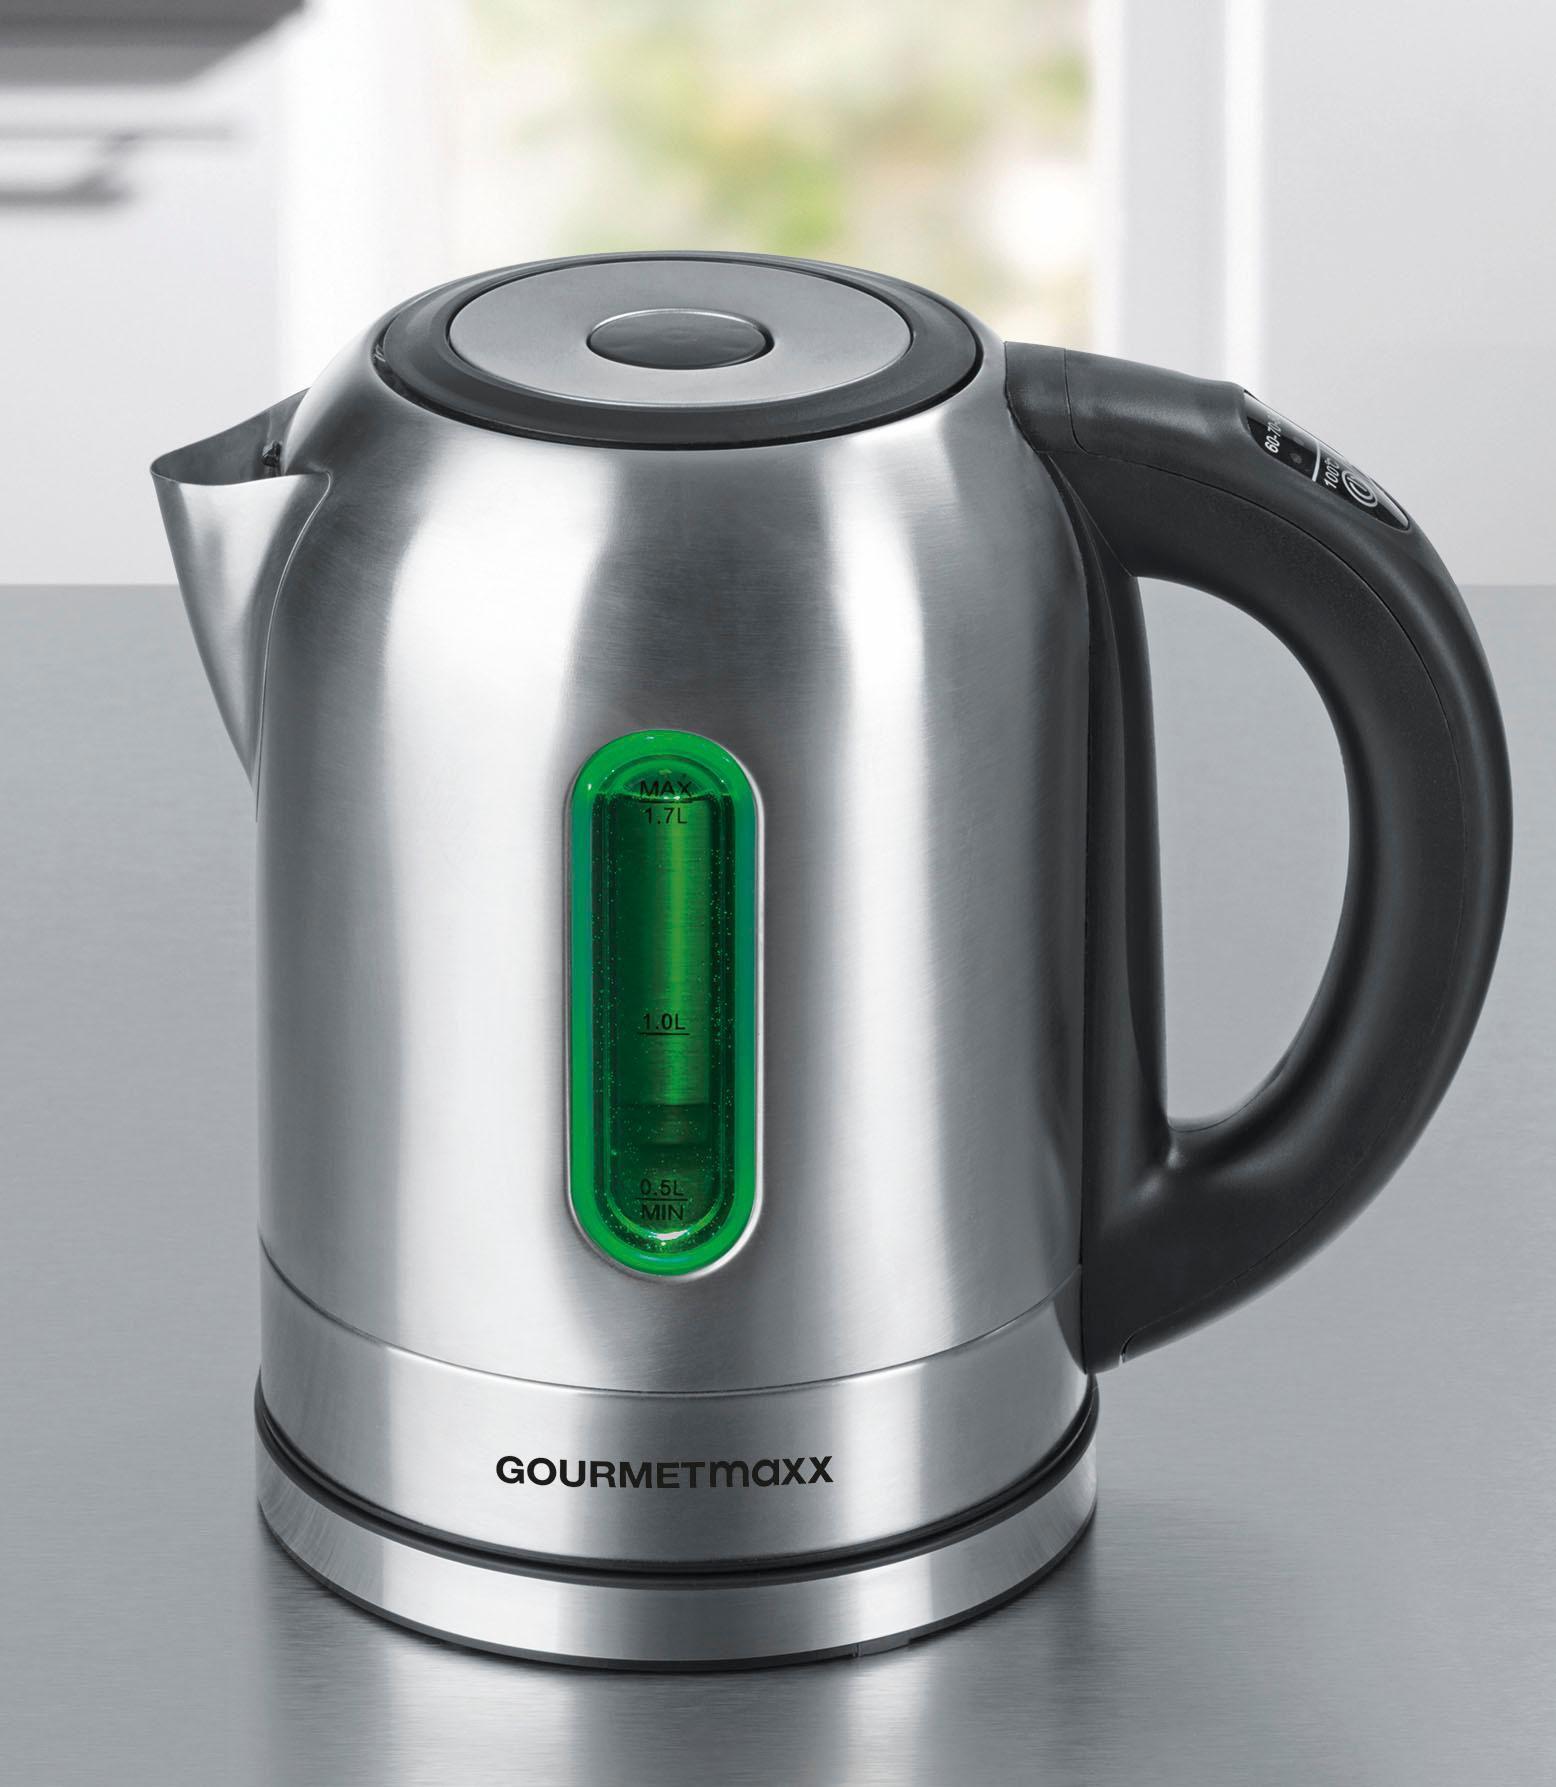 GOURMETMAXX Gourmet Maxx Wasserkocher, LED-Temperaturwahl, 1,7 Liter, 2200 Watt, Edelstahl